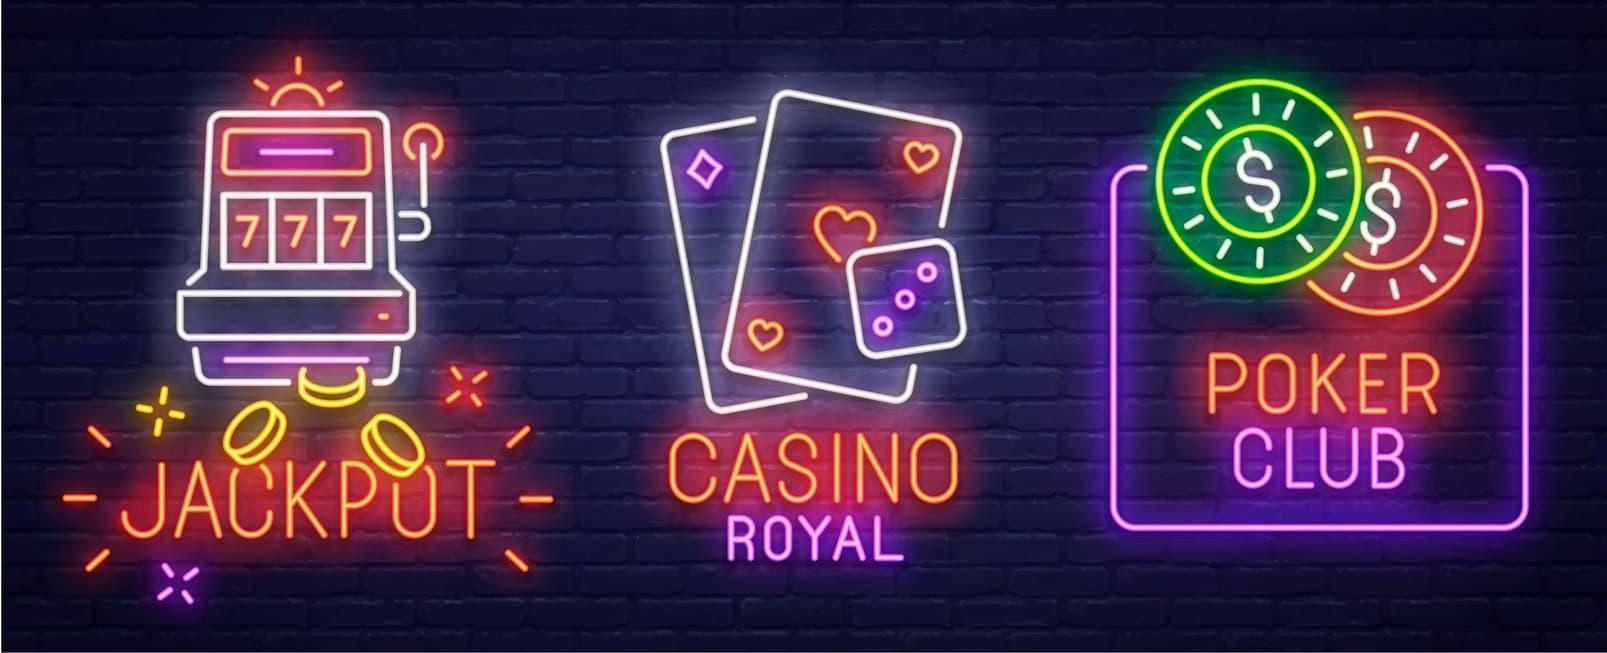 Neon skilt med online spil